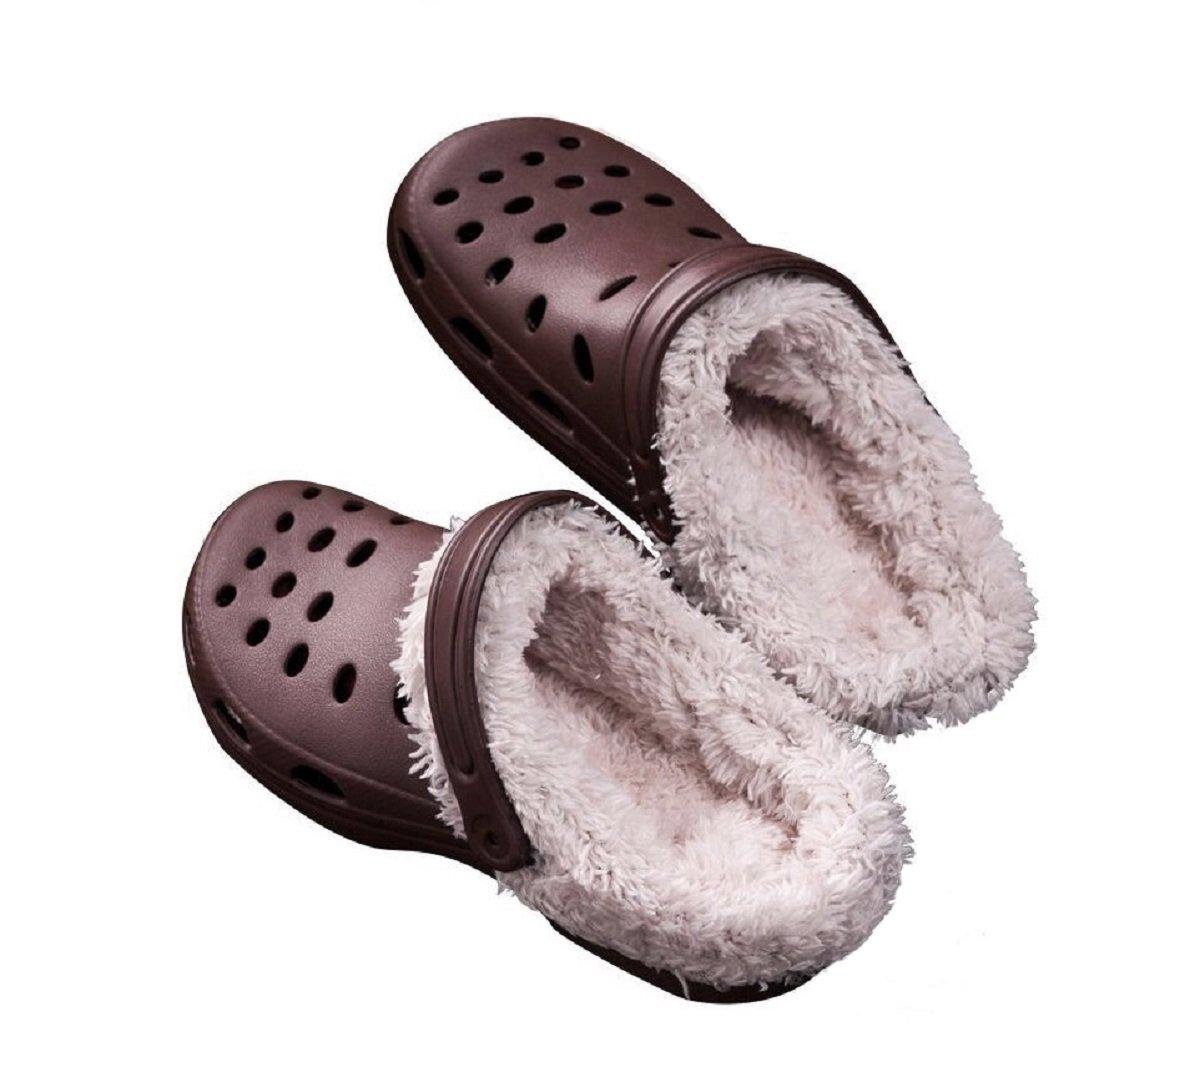 Rainoop Women Garden Shoes Fashion Autumn Winter Warm Slippers Breathable mesh Faux Fur Slip On Adjustable Straps Indoor Outdoor Brown 37